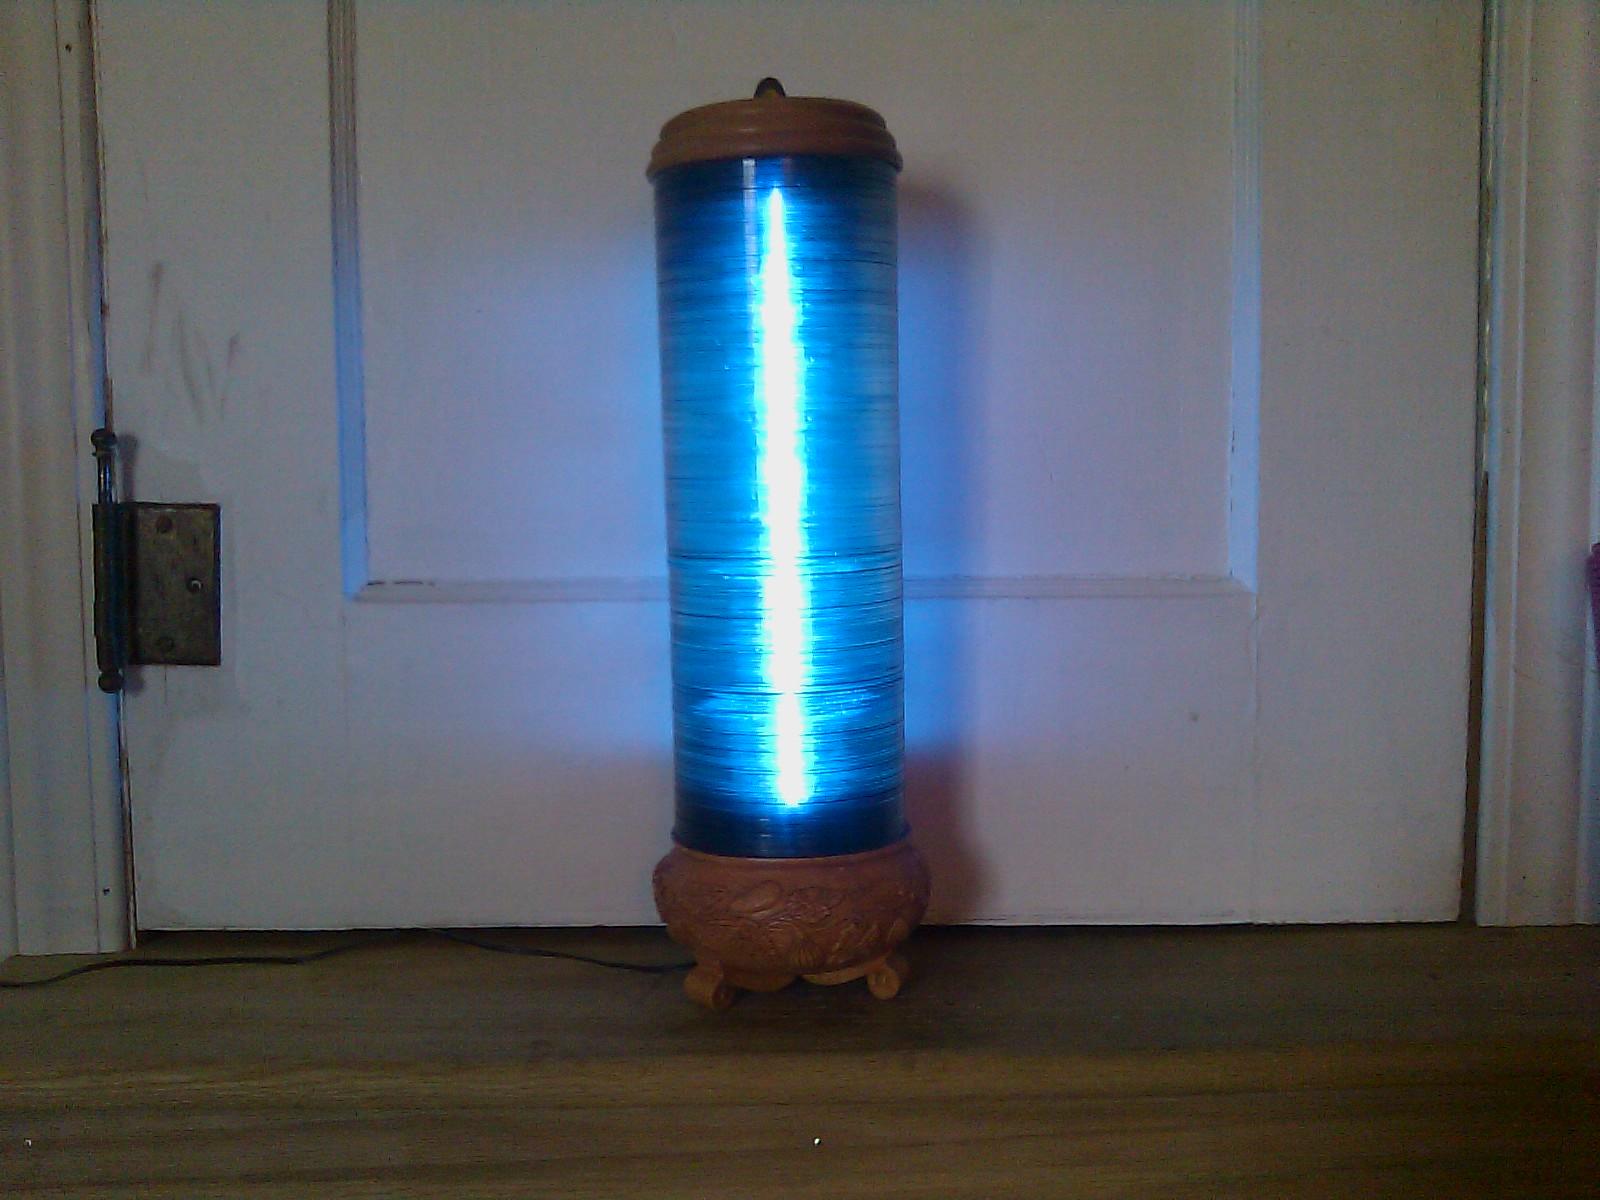 CD tower light